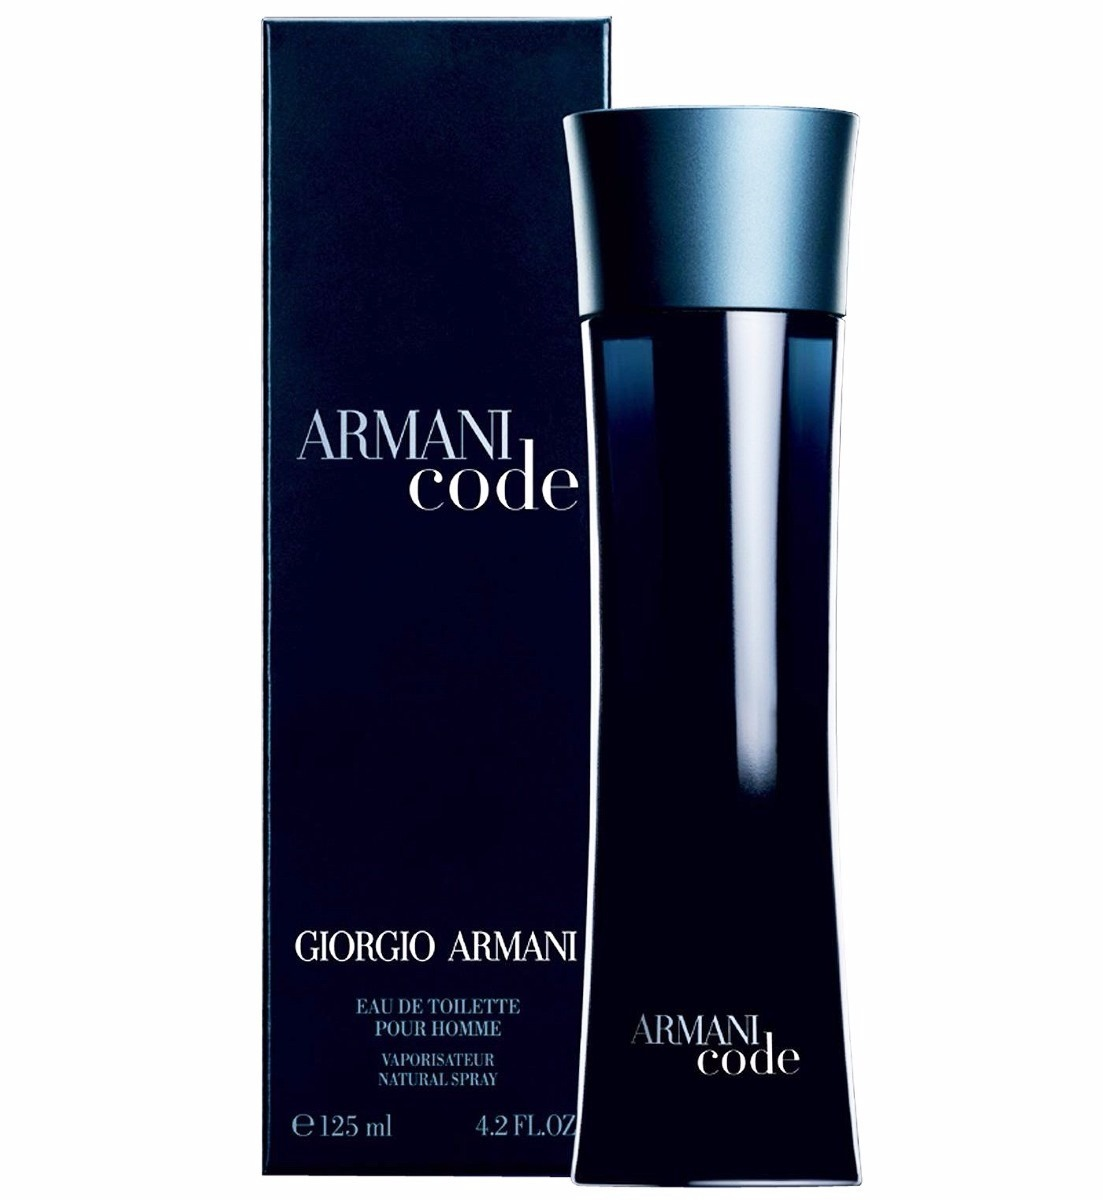 231b4b6f0 perfume armani code masculino 125ml giorgio armani- original. Carregando  zoom.